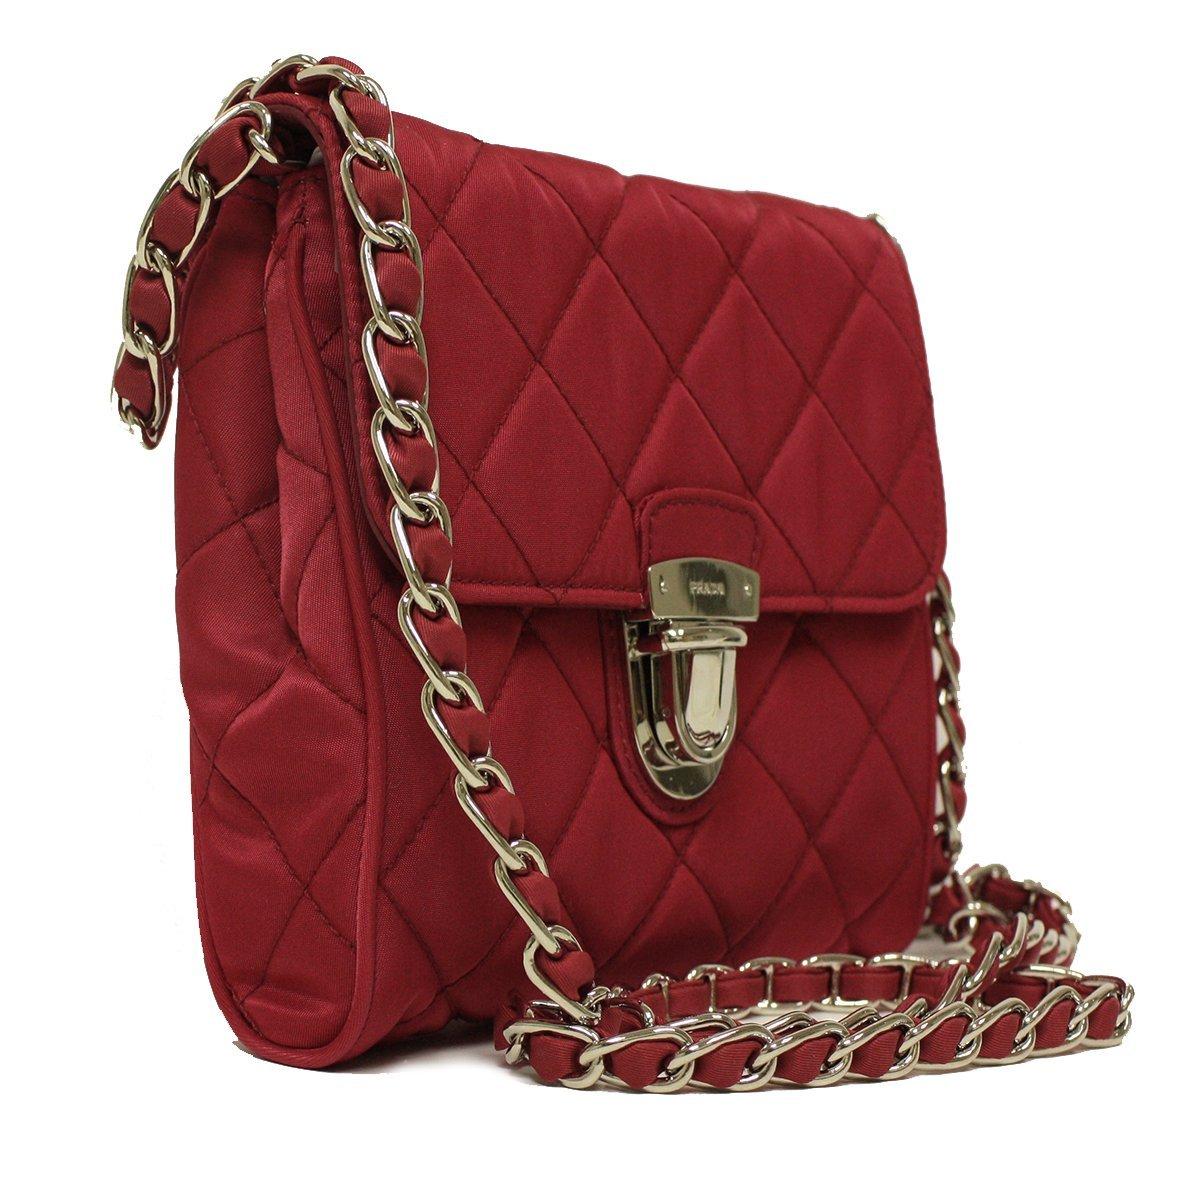 51ea87d64f5e6a Prada BP0623 Hot Pink Tessuto Impuntu Pattina Nylon and Leather Chain  Crossbody Bag: Amazon.ca: Shoes & Handbags